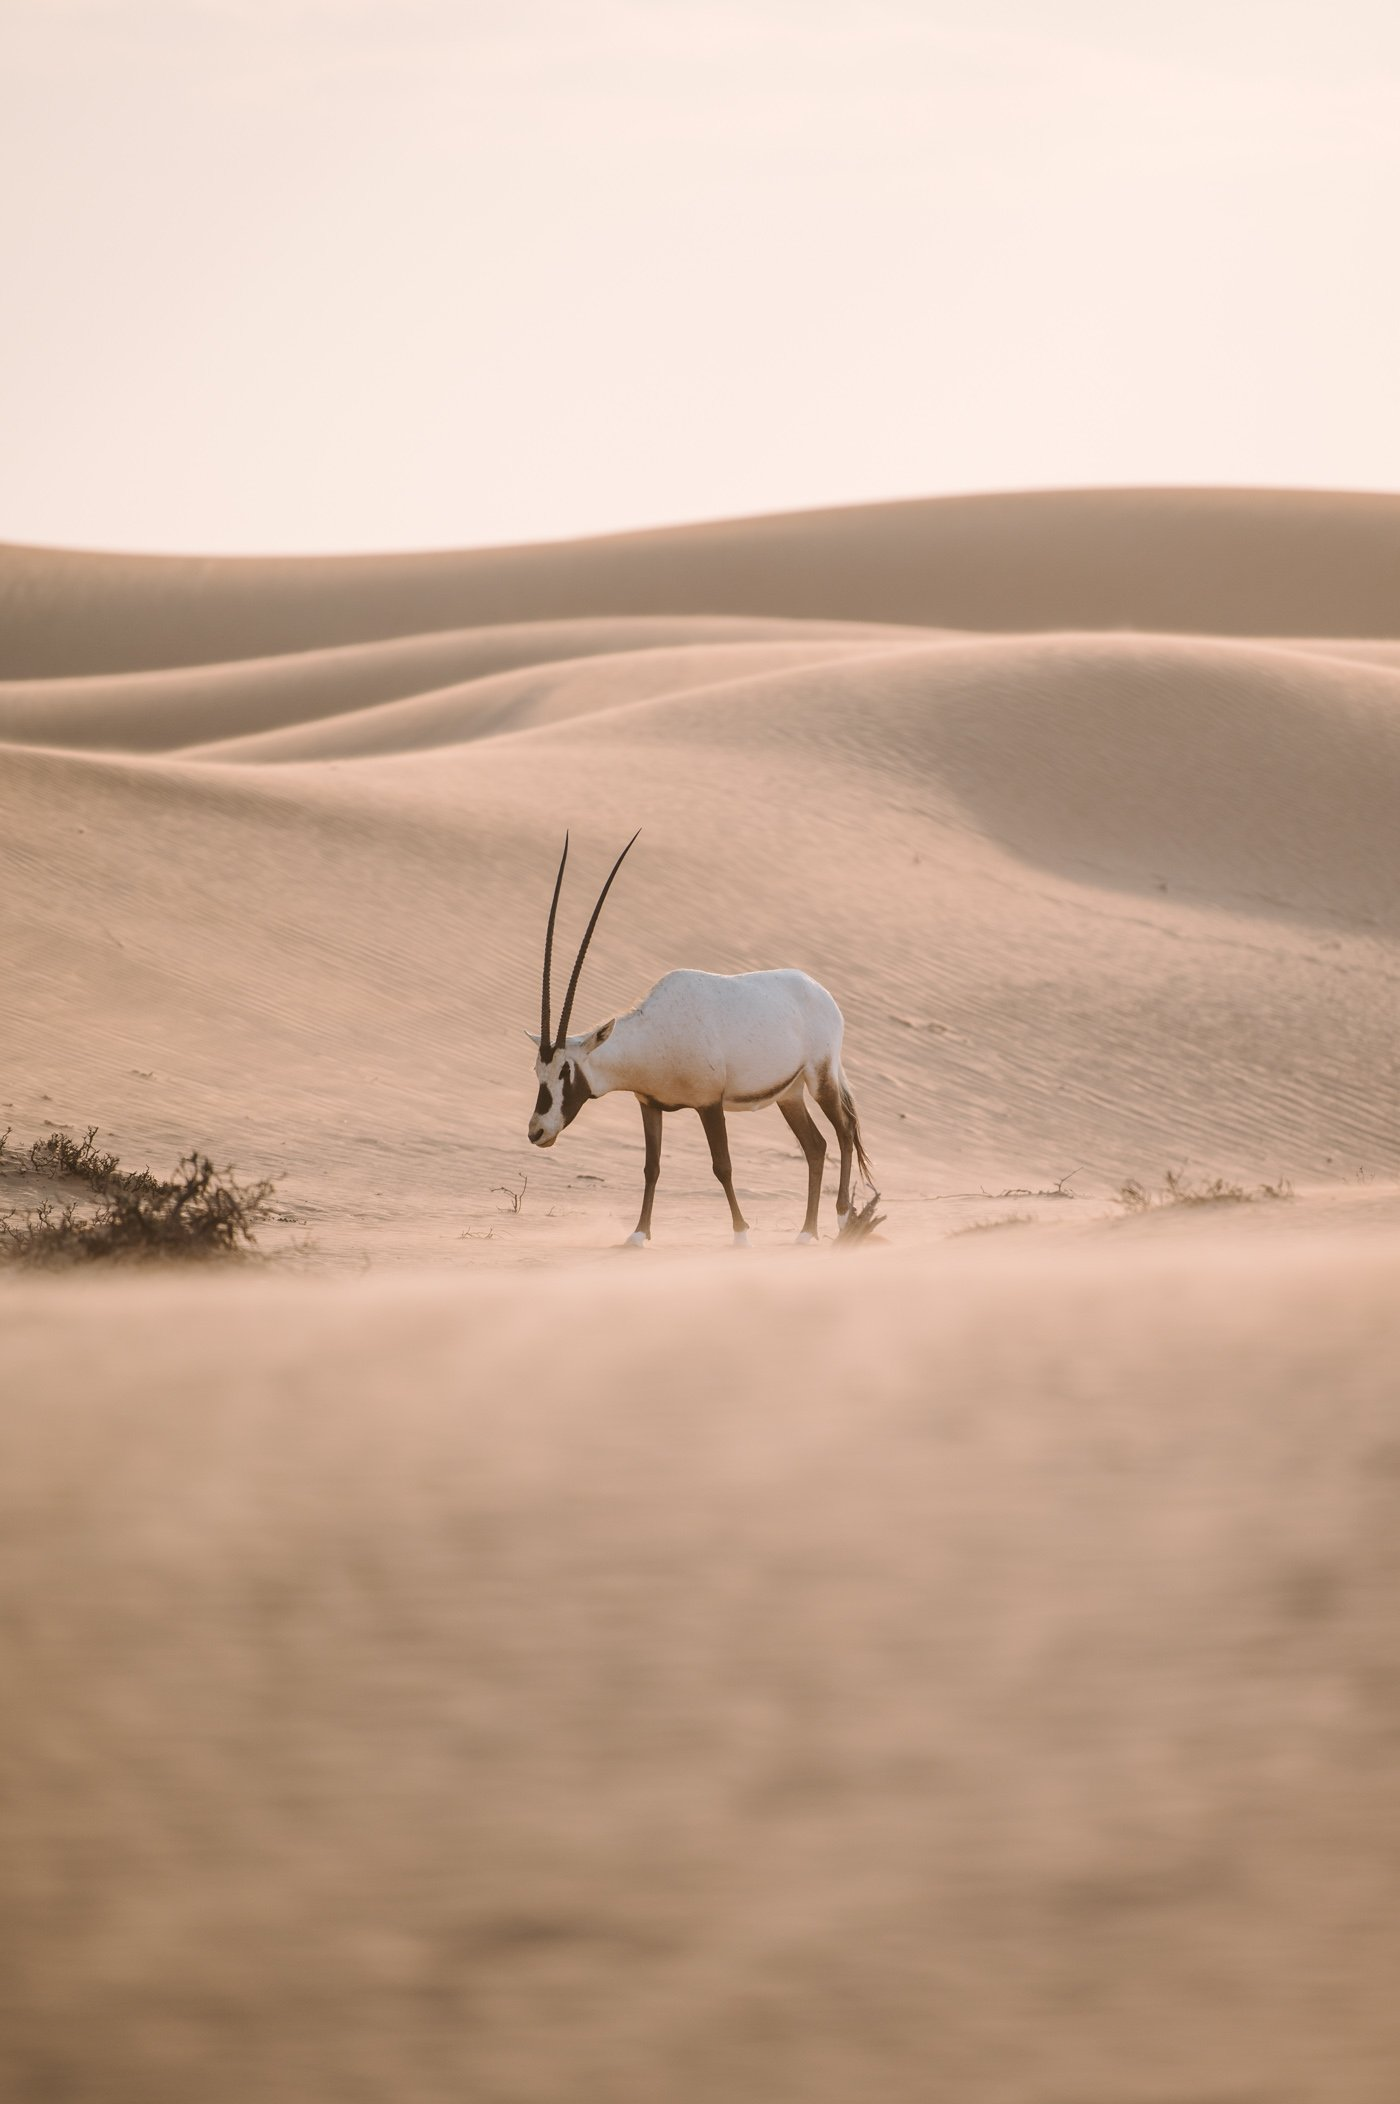 Arabian Oryx in the desert of Dubai